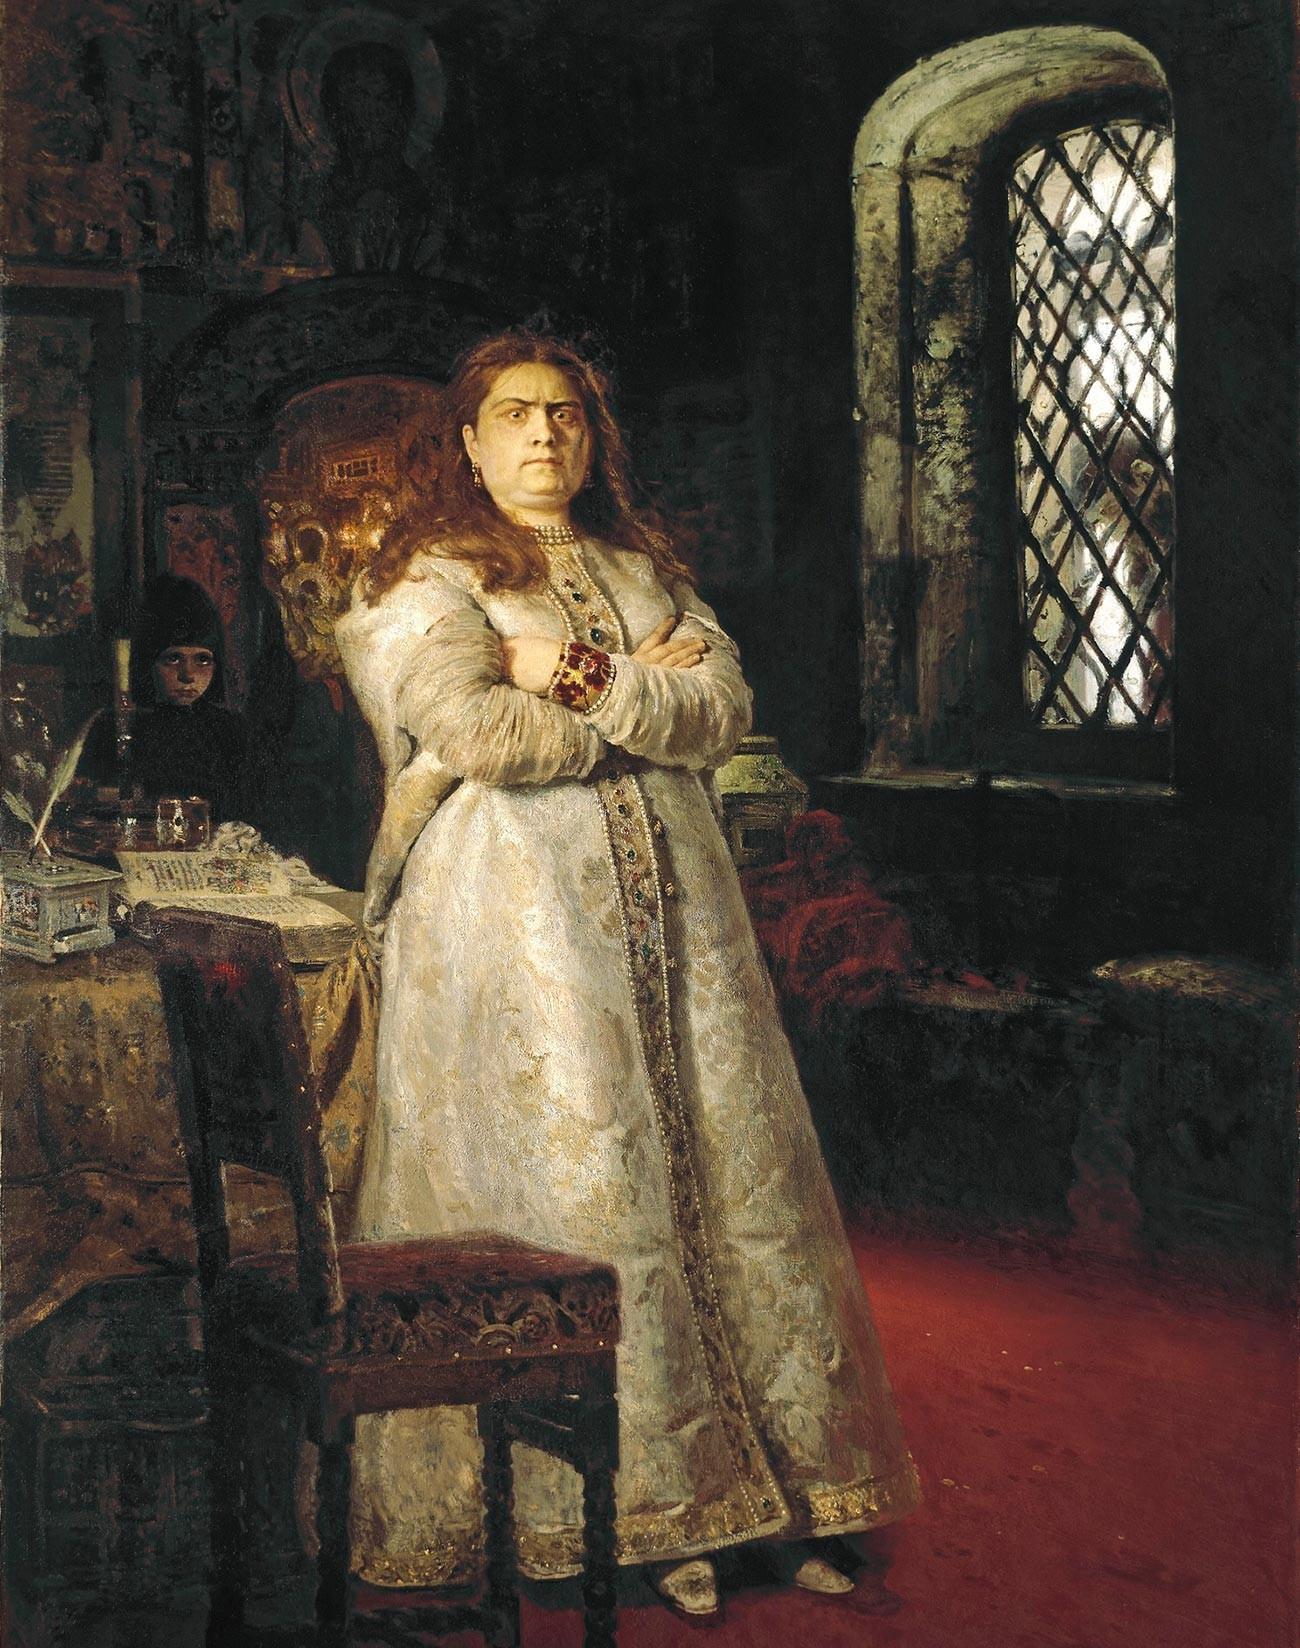 Ilya Repin. Tsarevna Sofya in the Novodevichy Convent